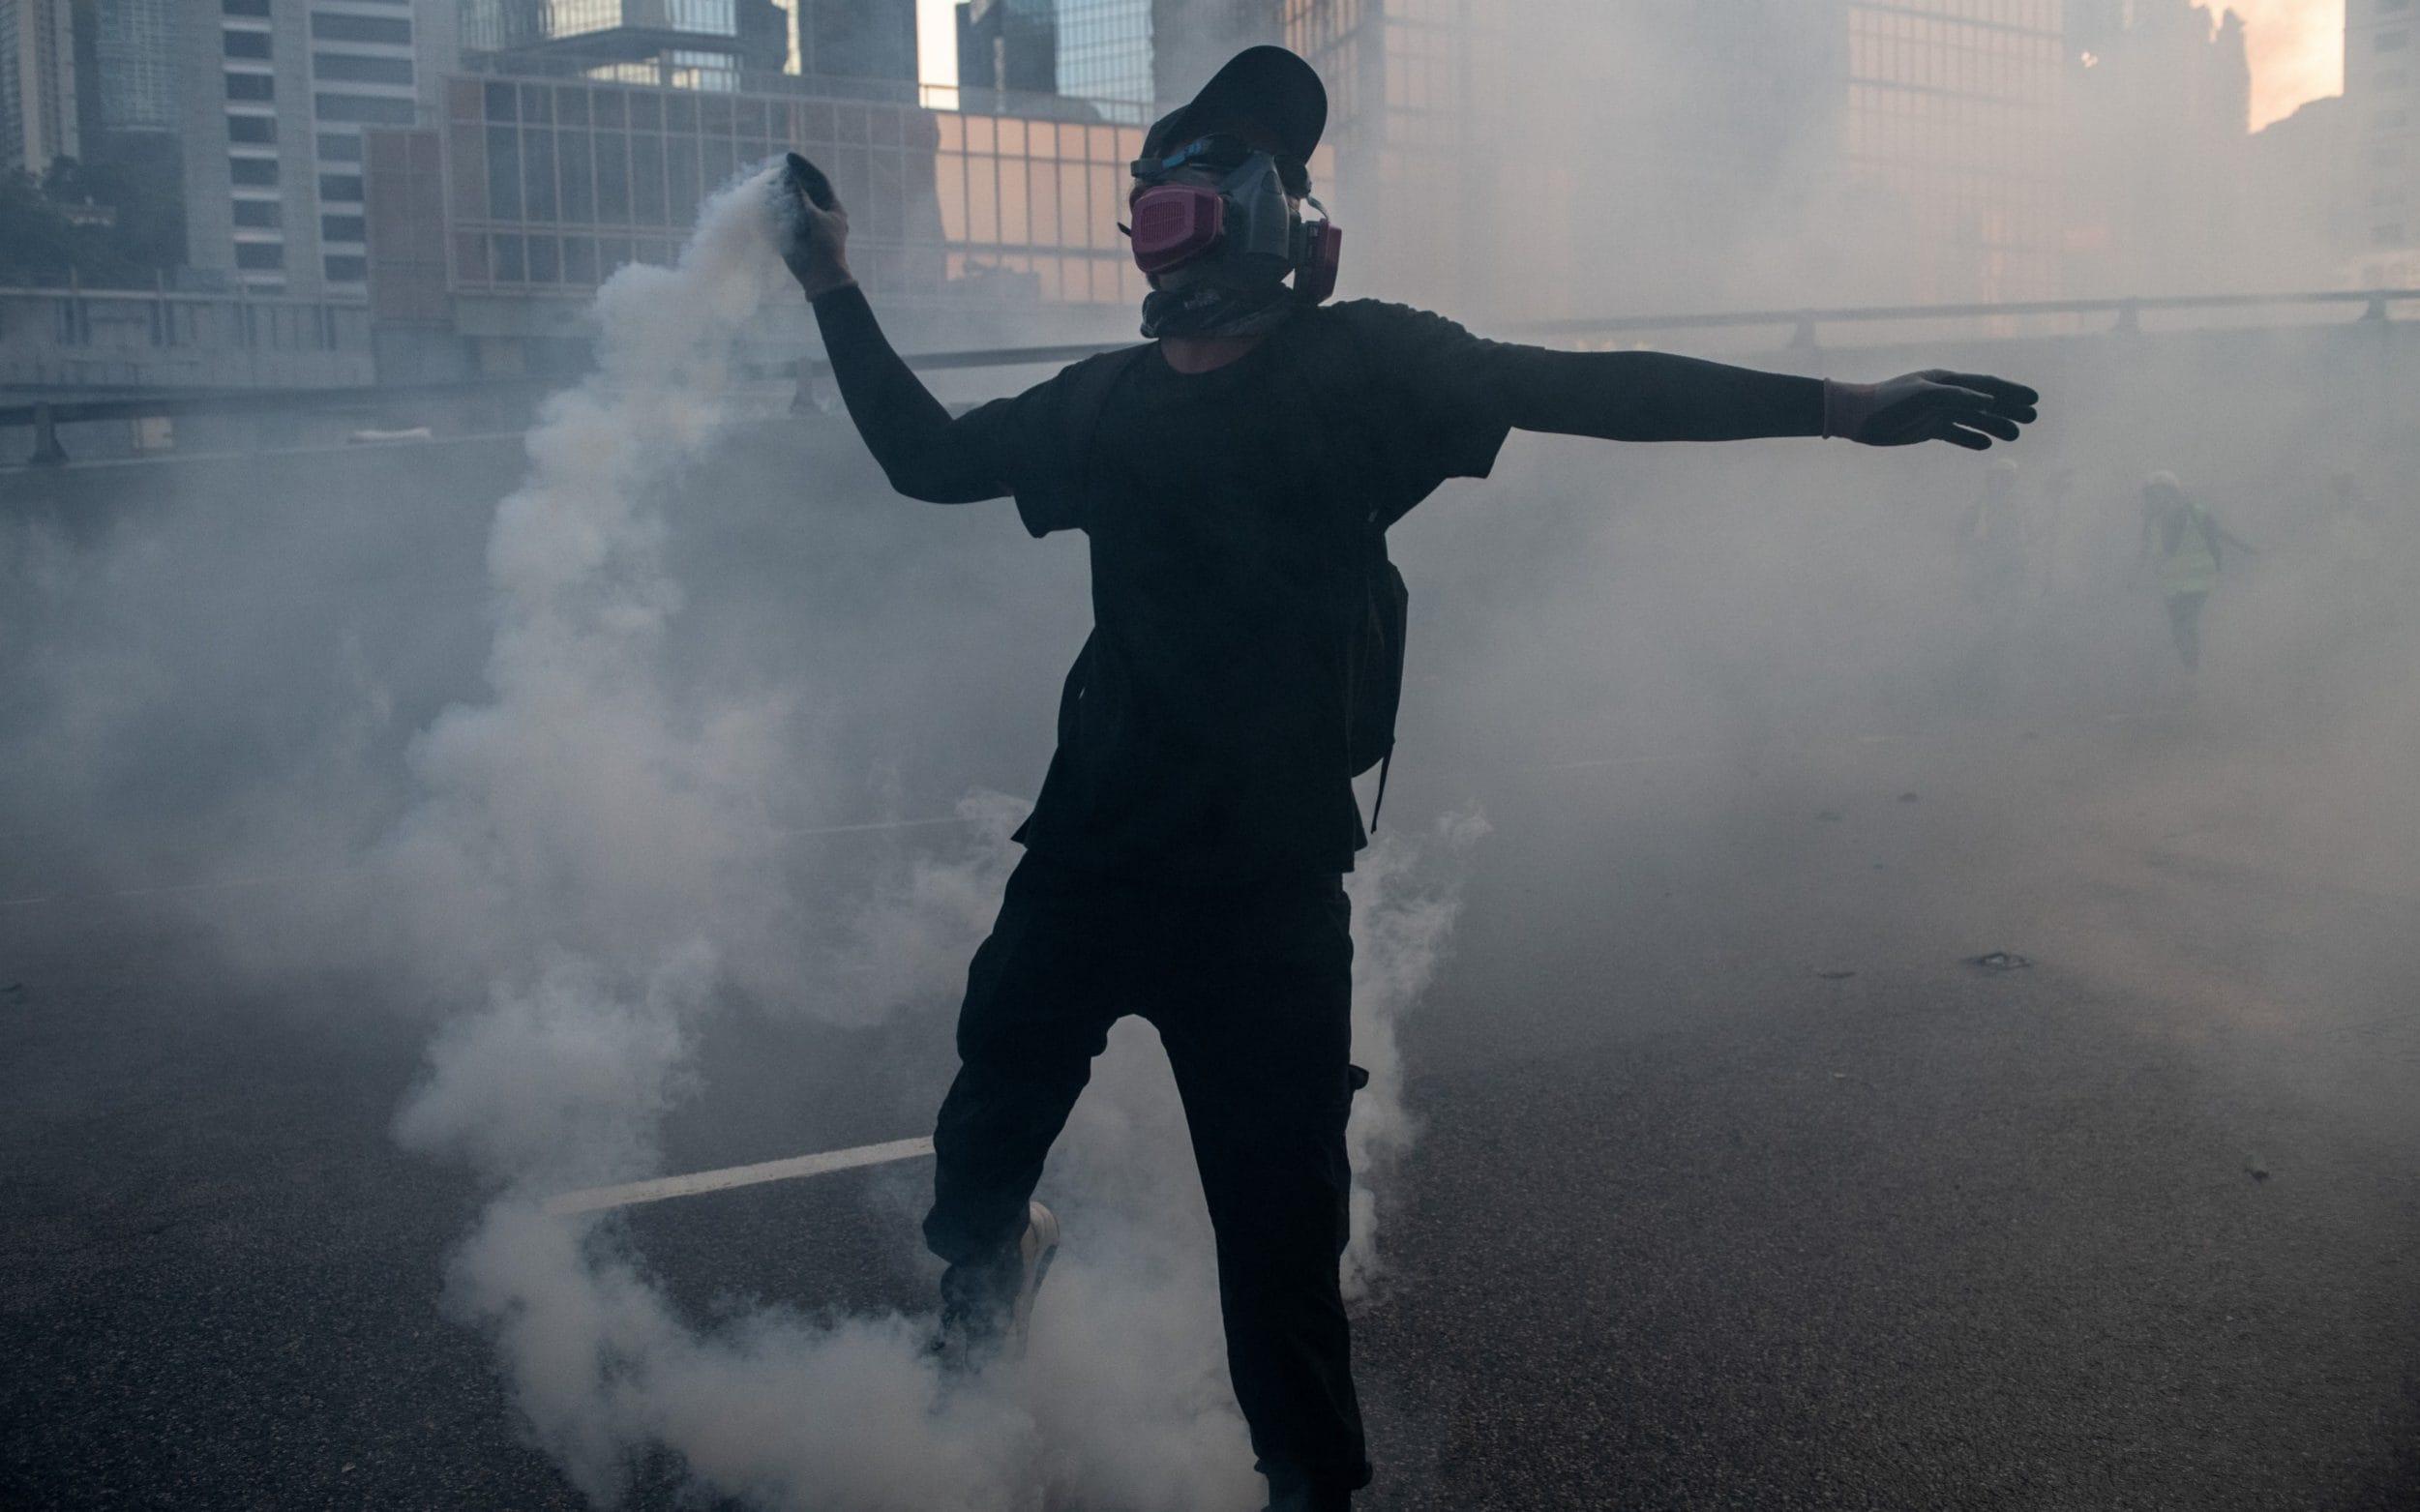 Hong Kong police warn officers might have to kill someone as violence escalates